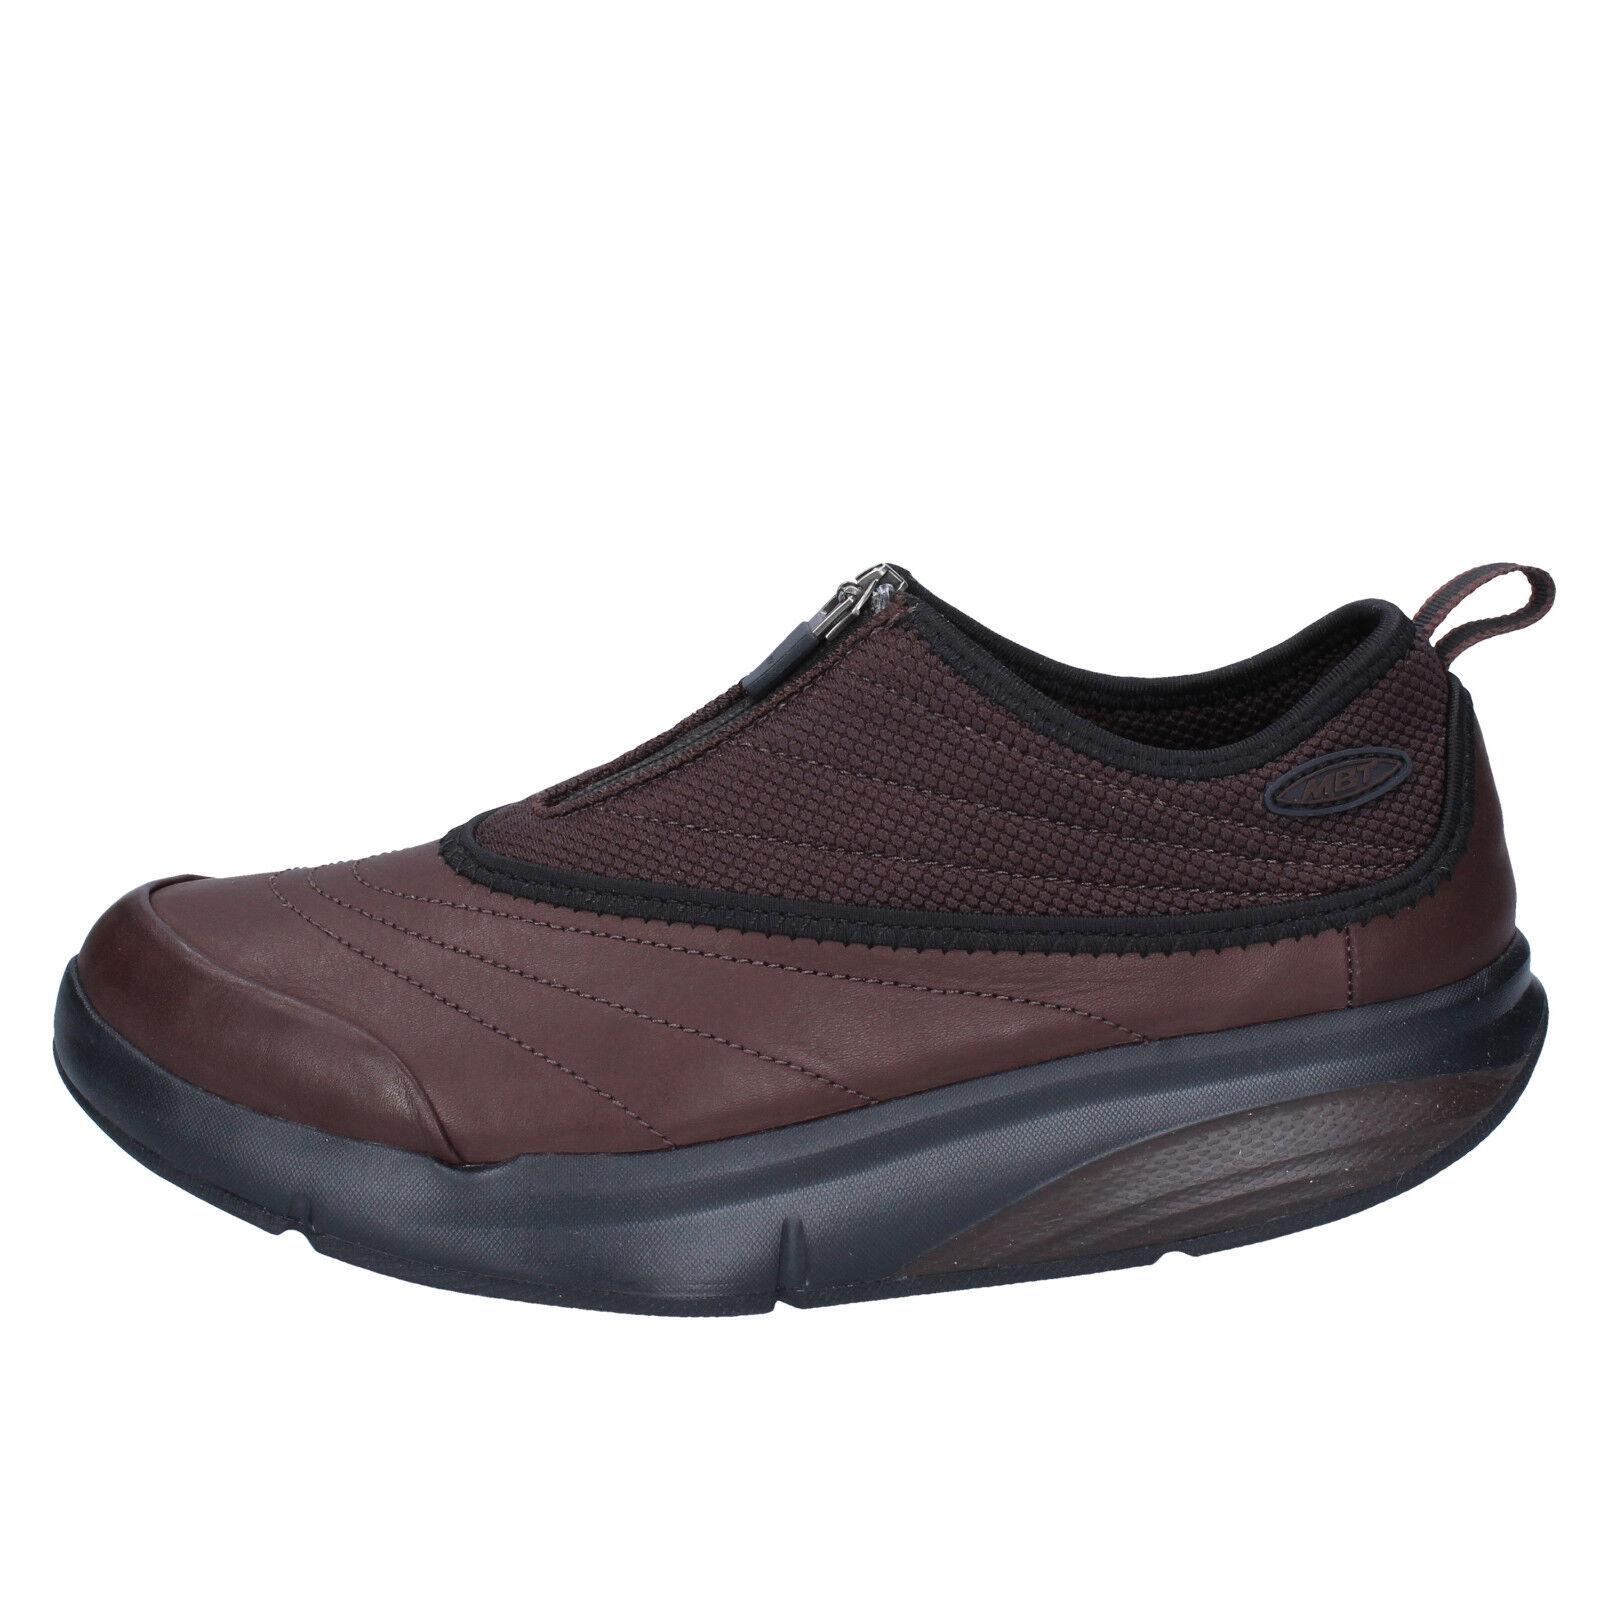 Scarpe donna MBT 37 scarpe da ginnastica marrone pelle tessuto BY963-37